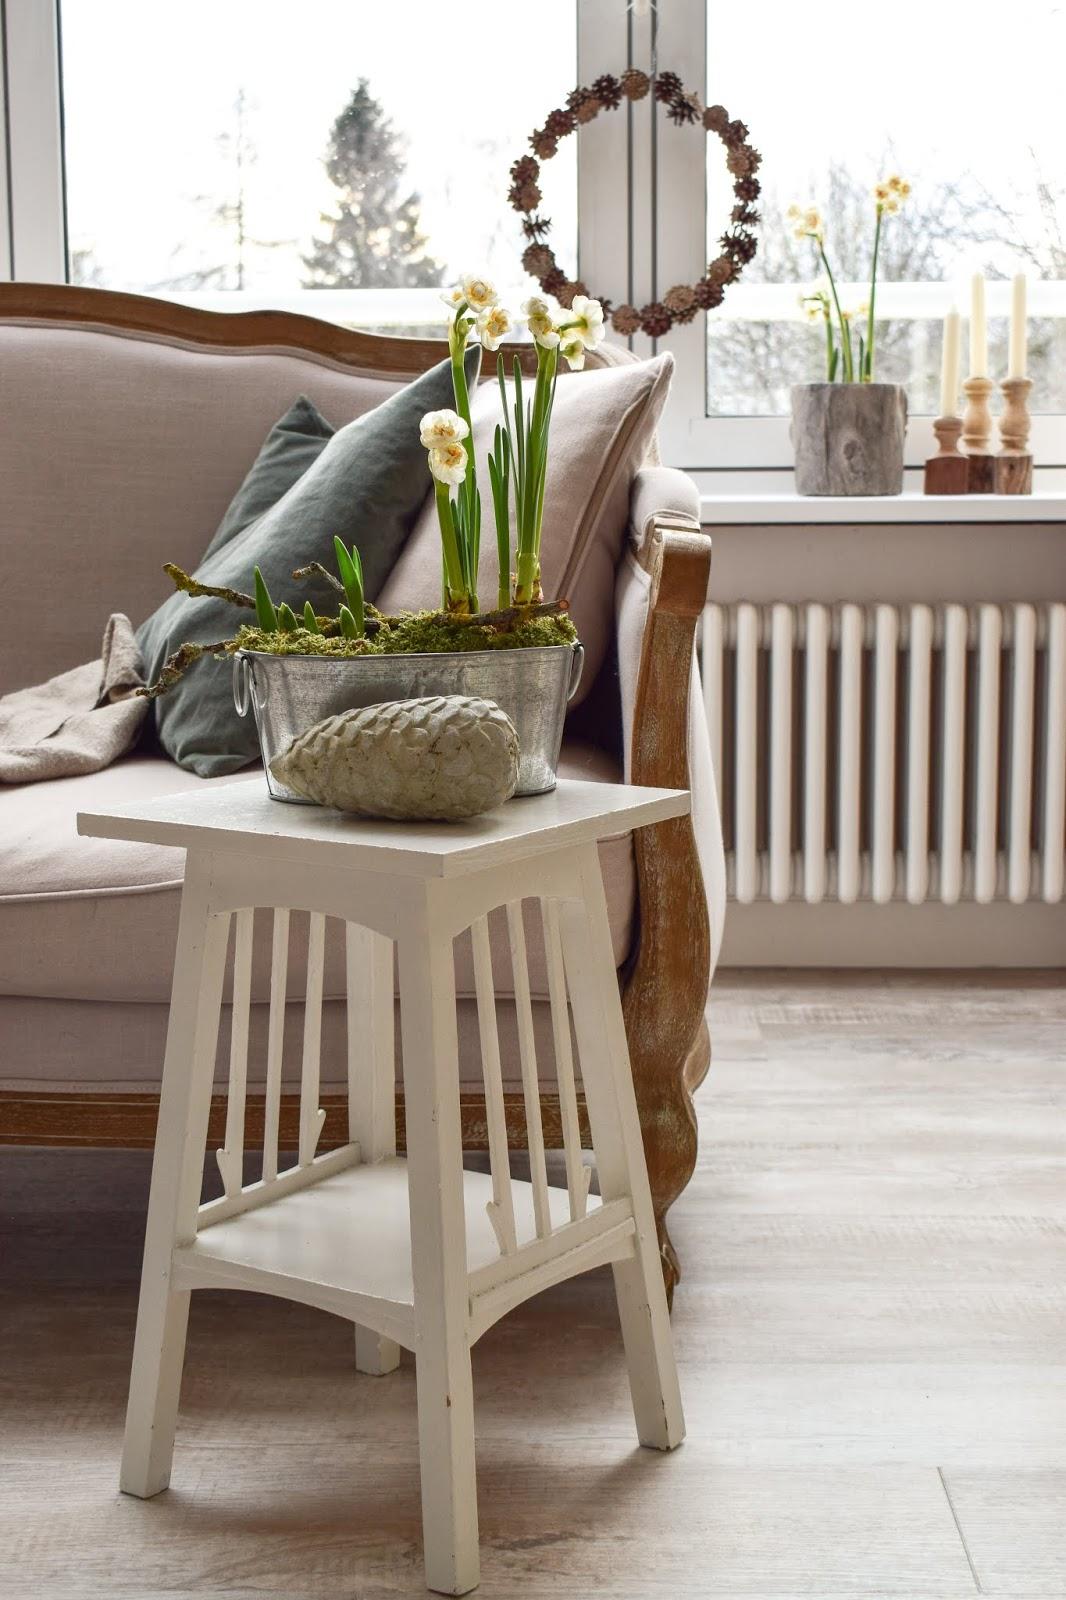 fr hlingst pfe schnell und einfach selber machen so geht s eclectic hamilton. Black Bedroom Furniture Sets. Home Design Ideas